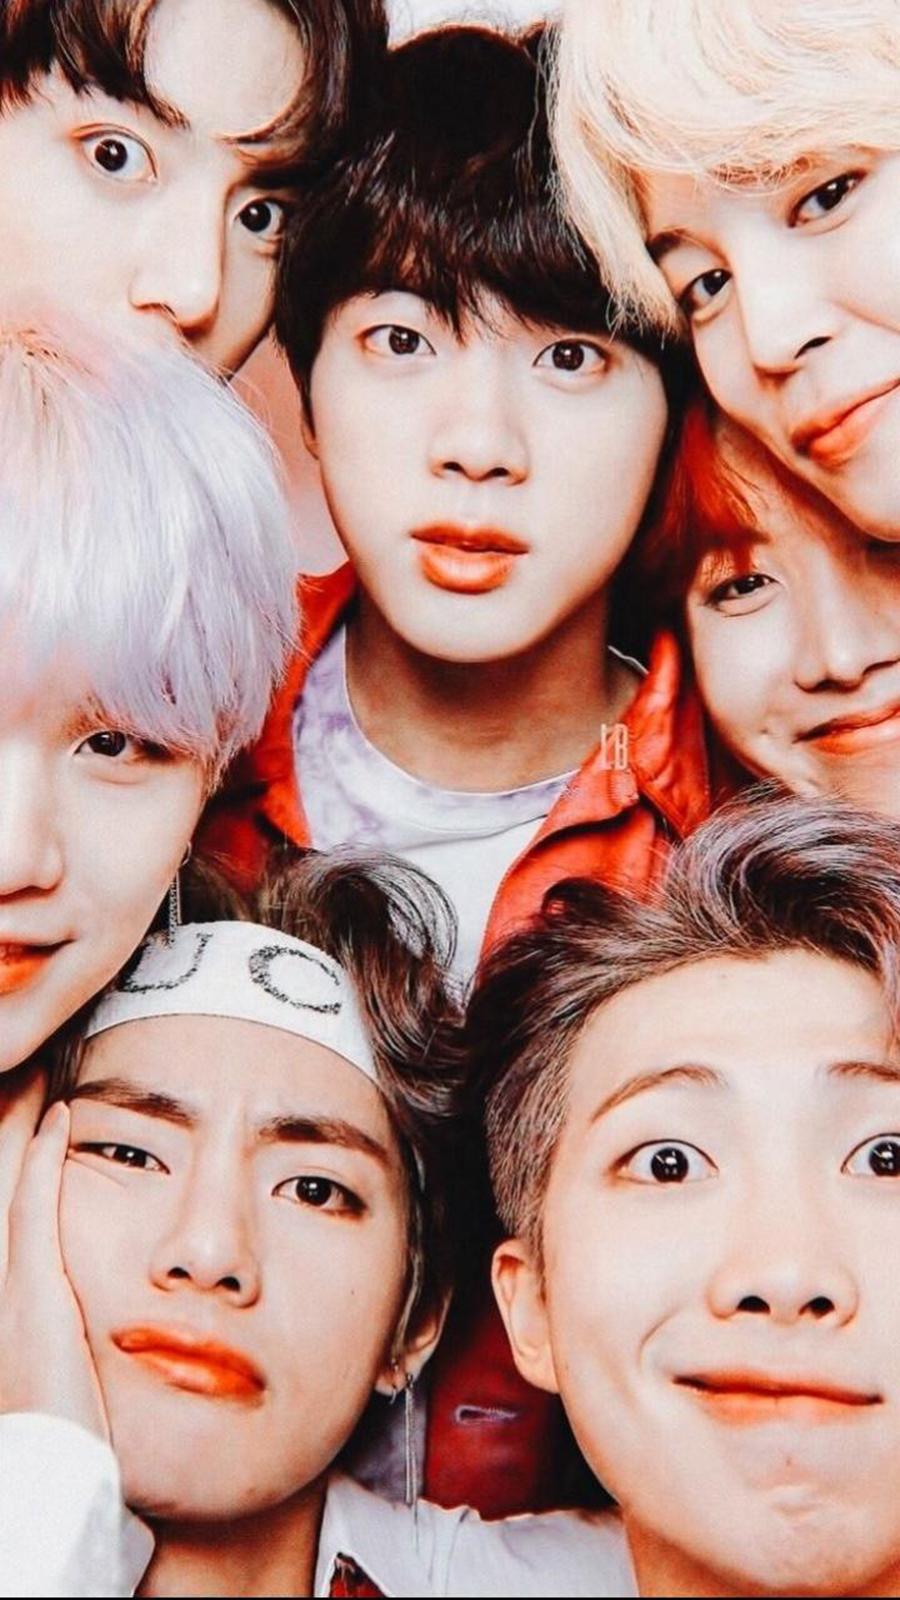 BTS Face Wallpaper – Korean Group BTS Wallpapers Free Download